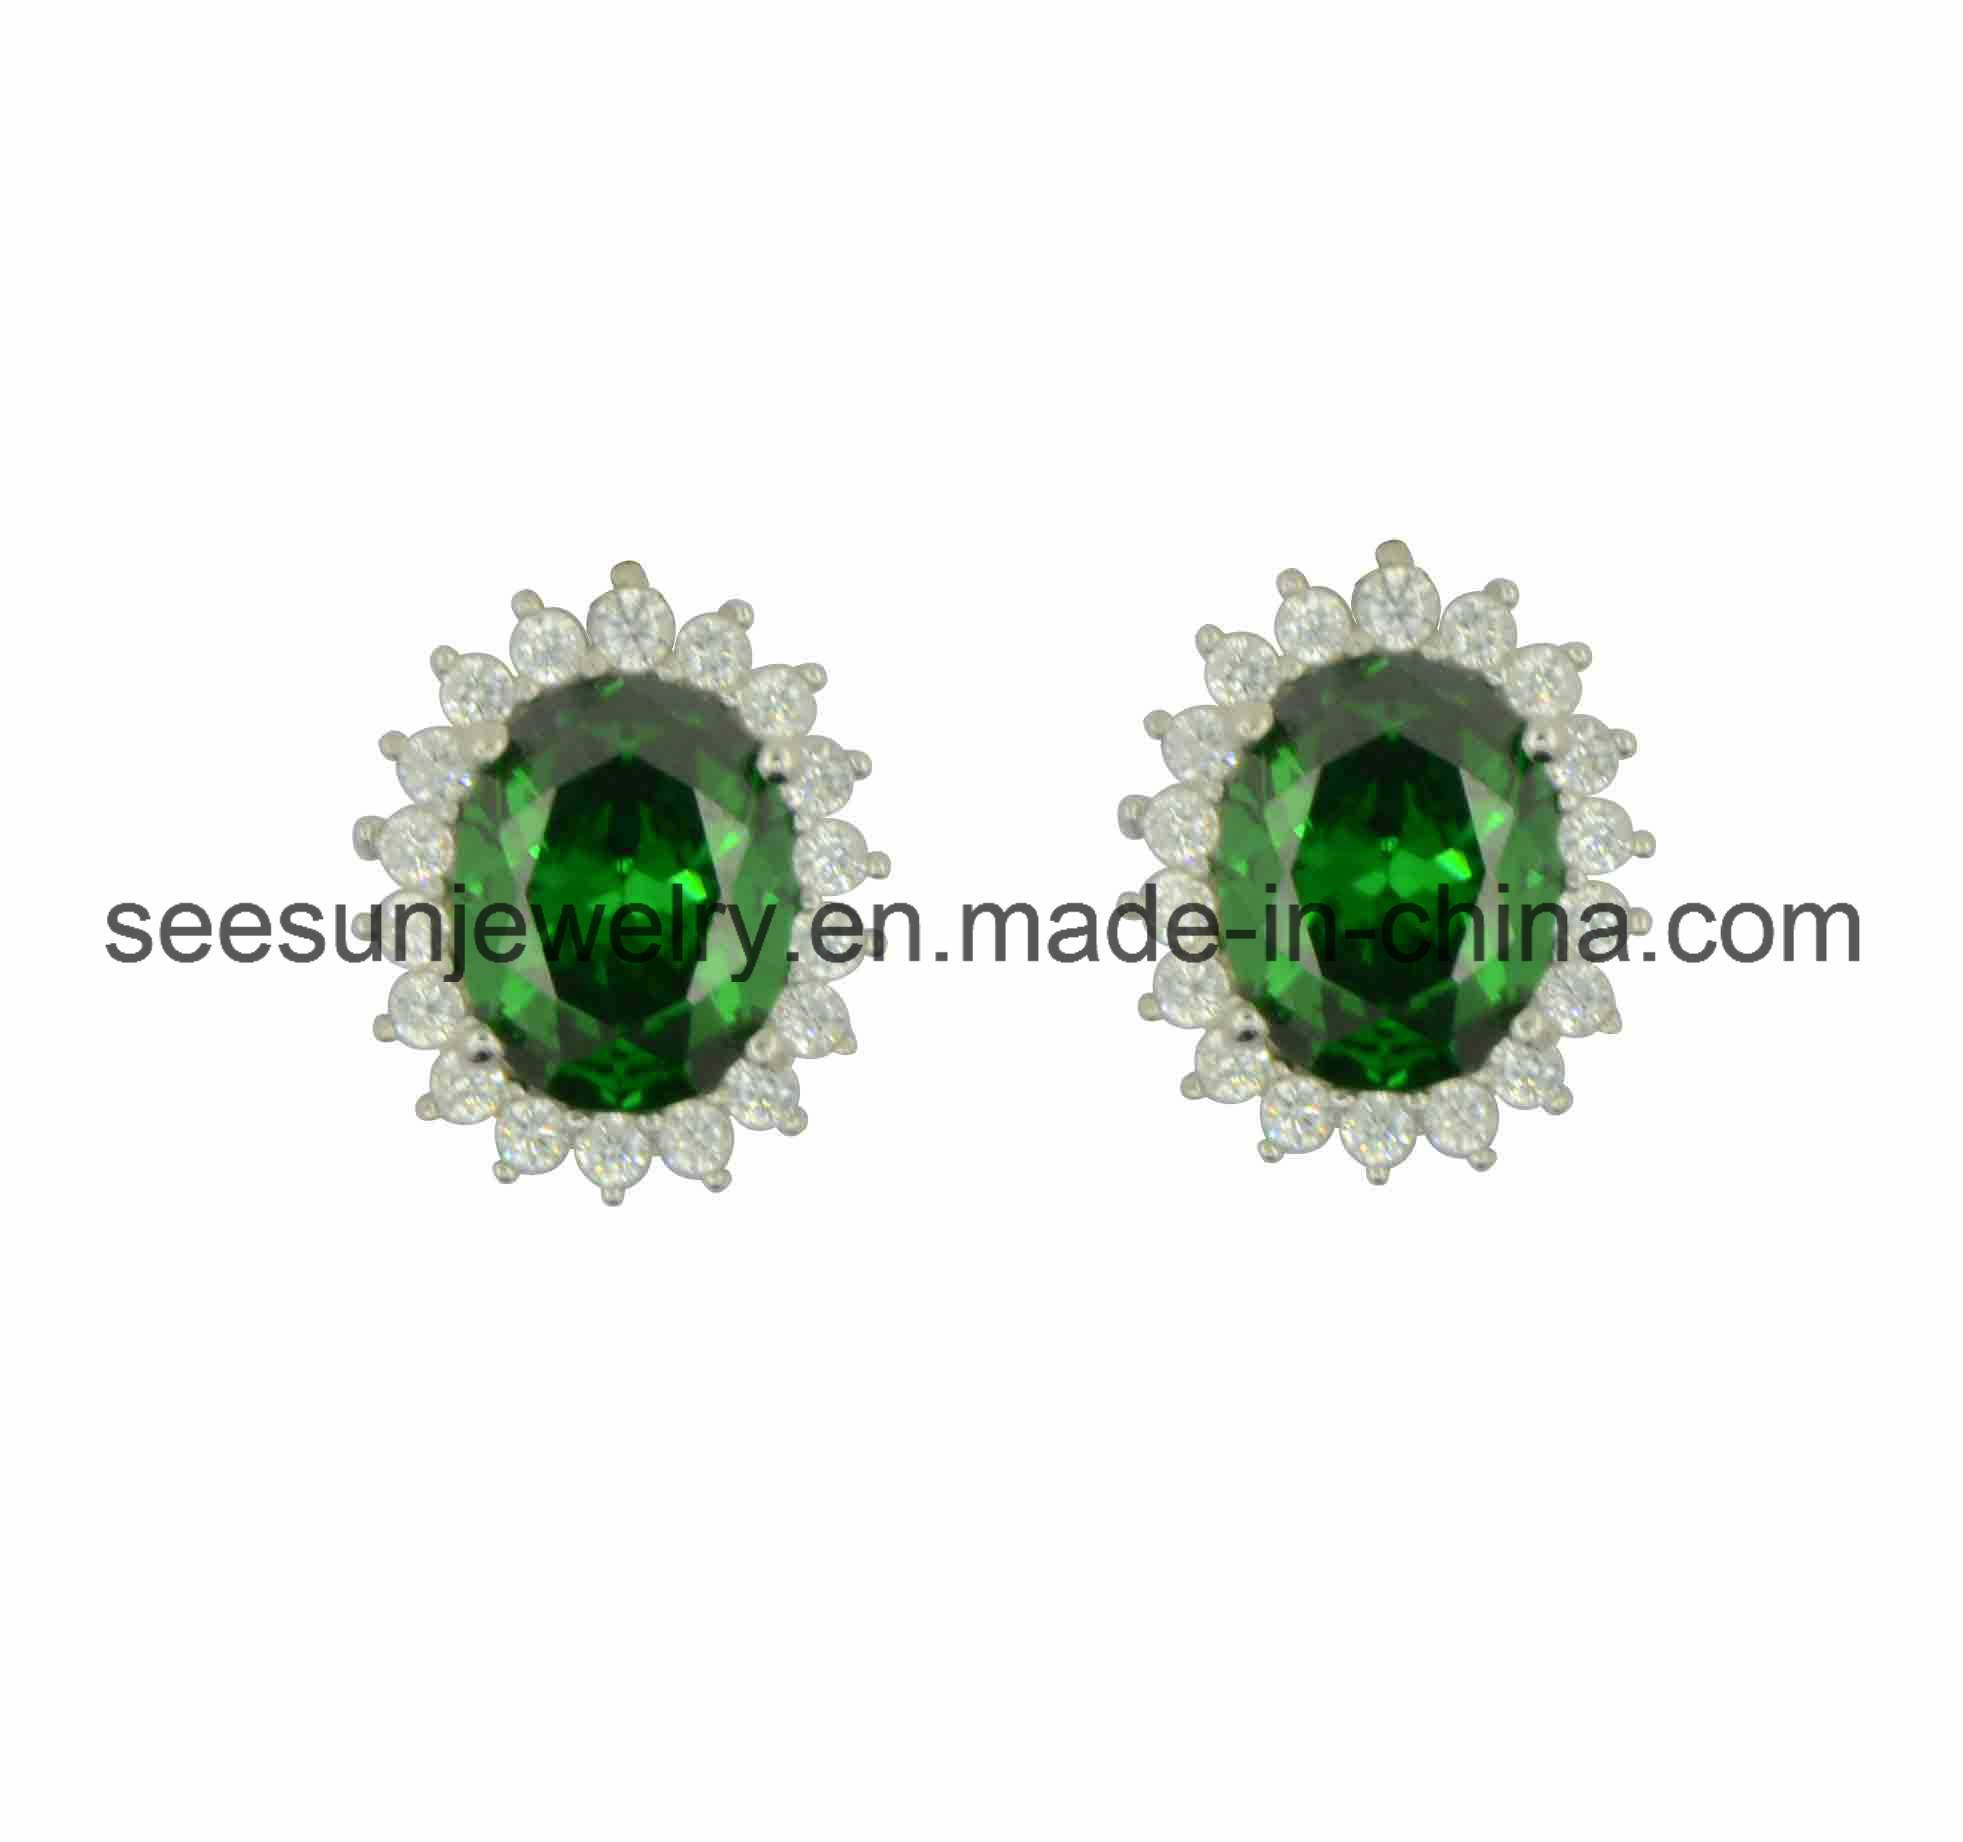 925 Silver Hotsale Earring with Emerald Green CZ for Women